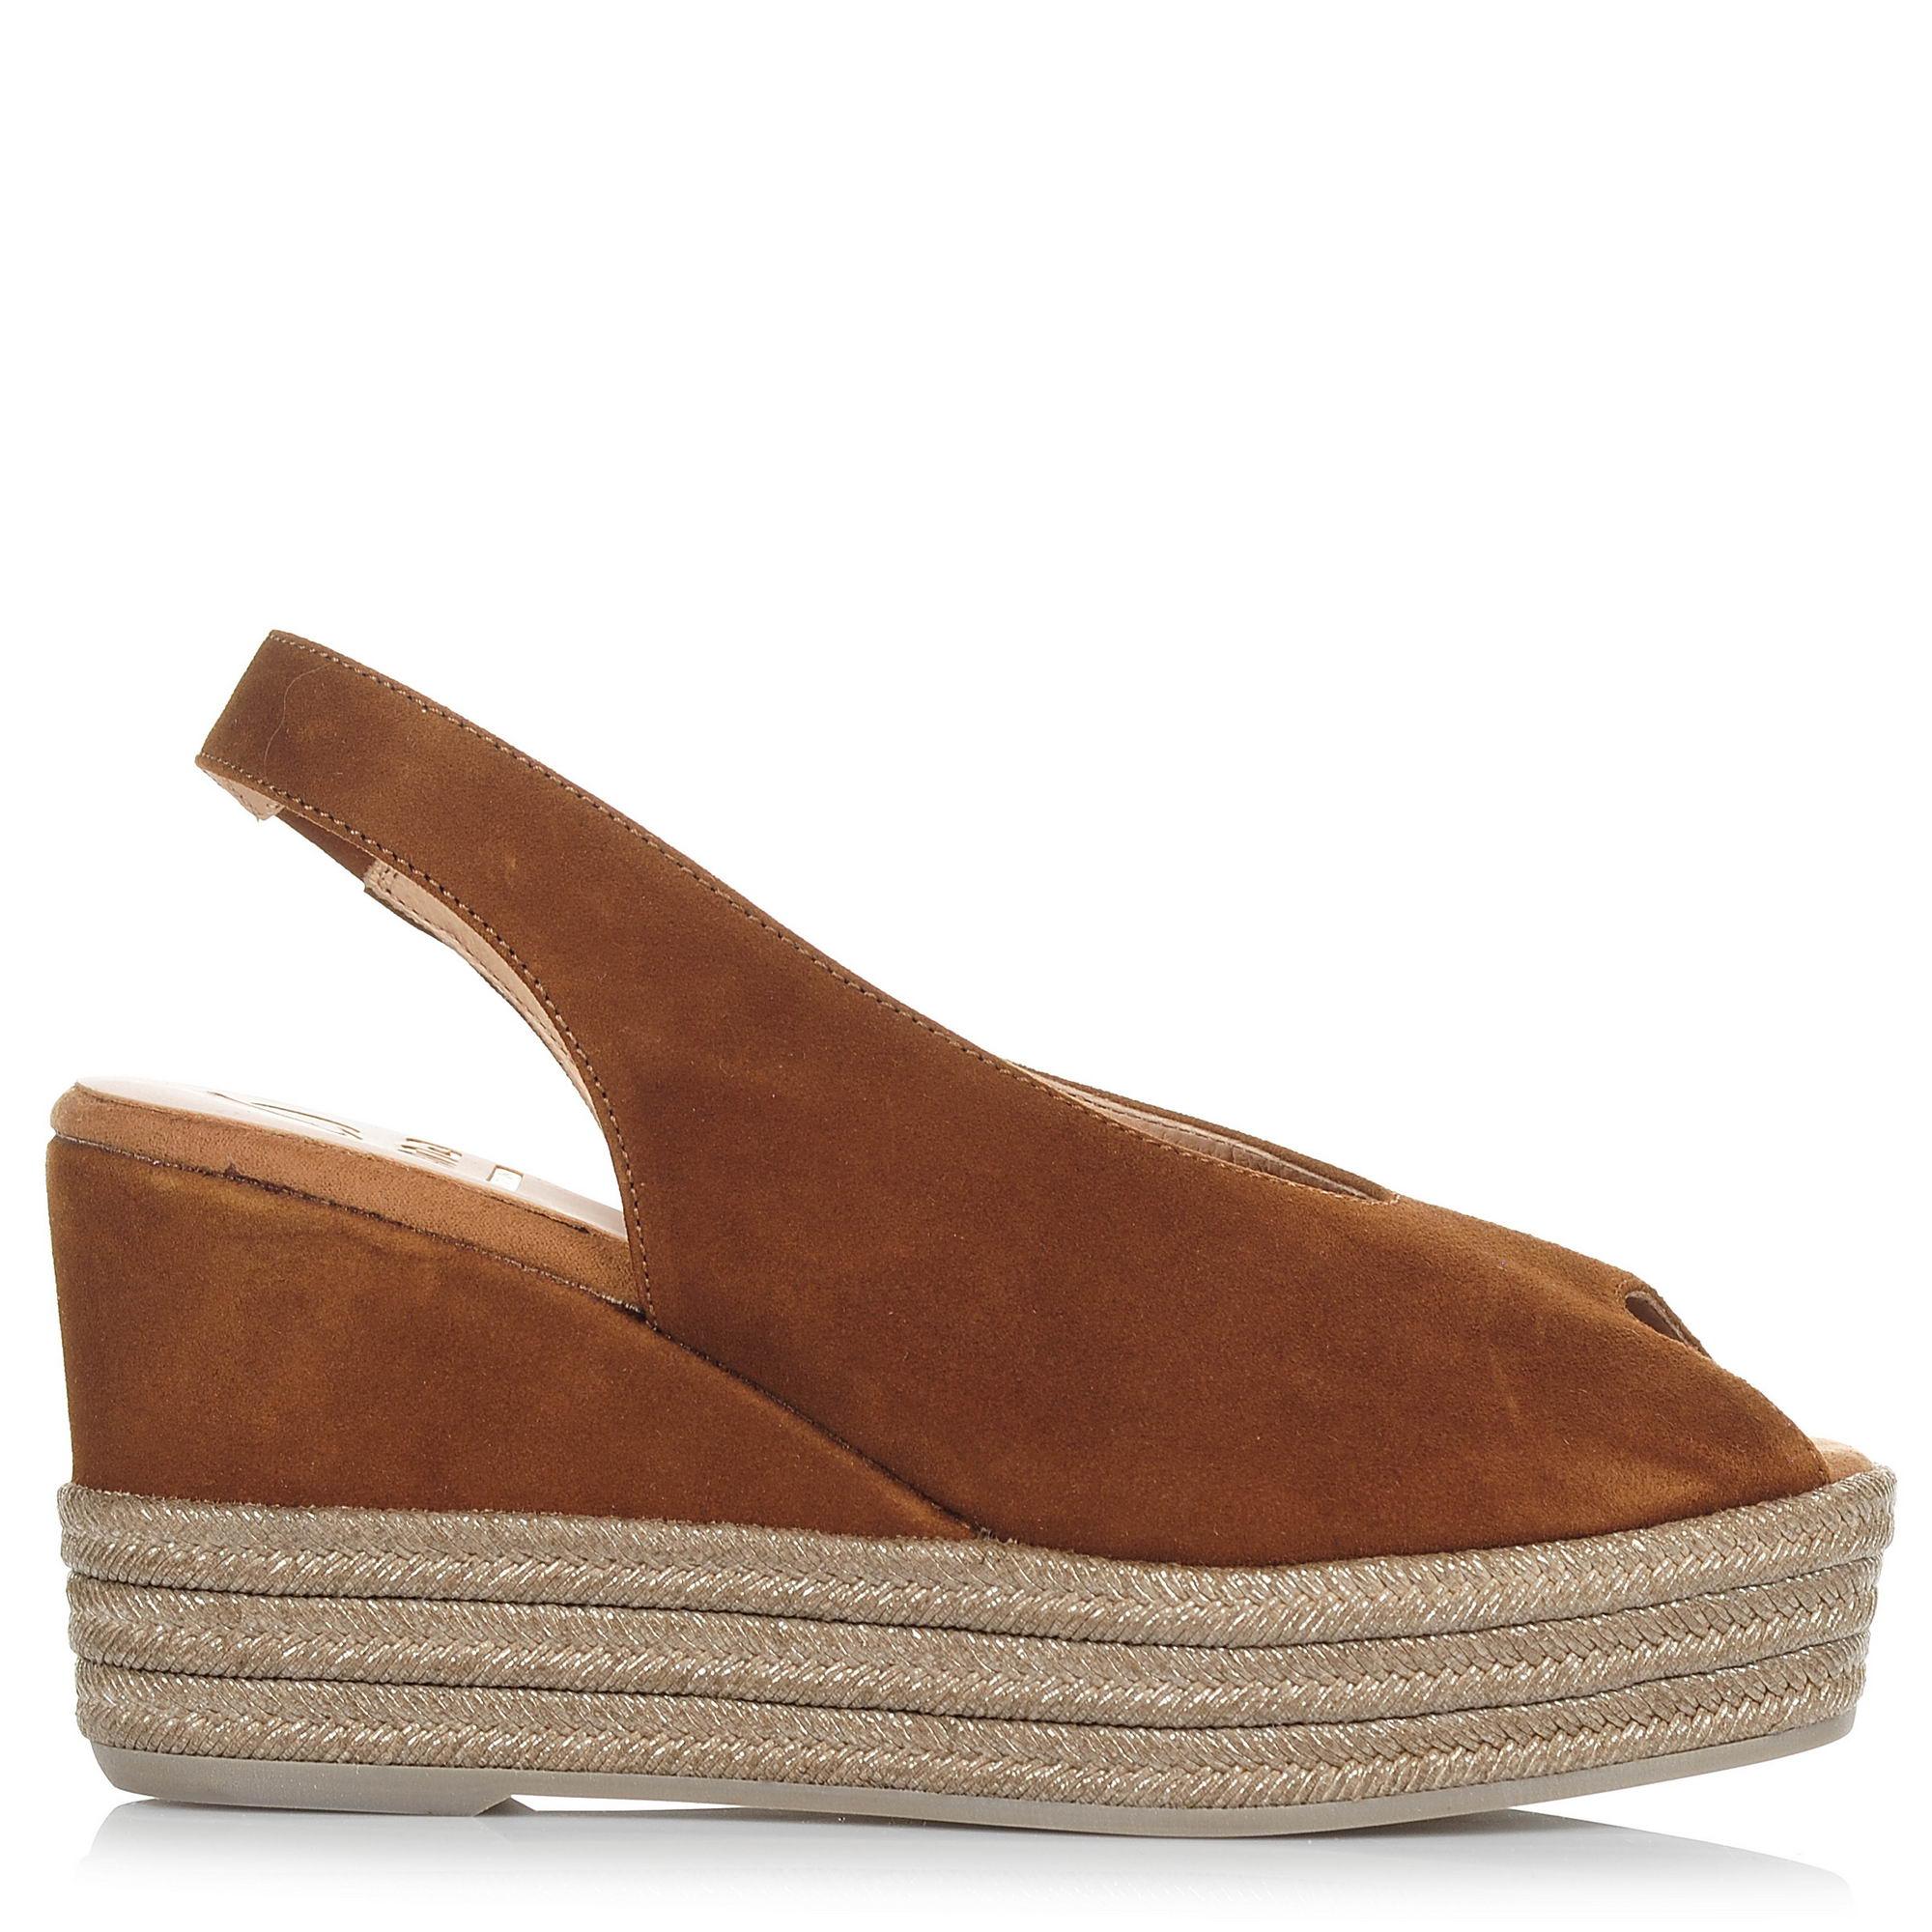 Suede Δερμάτινες Πλατφόρμες Kanna KV8280 γυναικα   γυναικείο παπούτσι